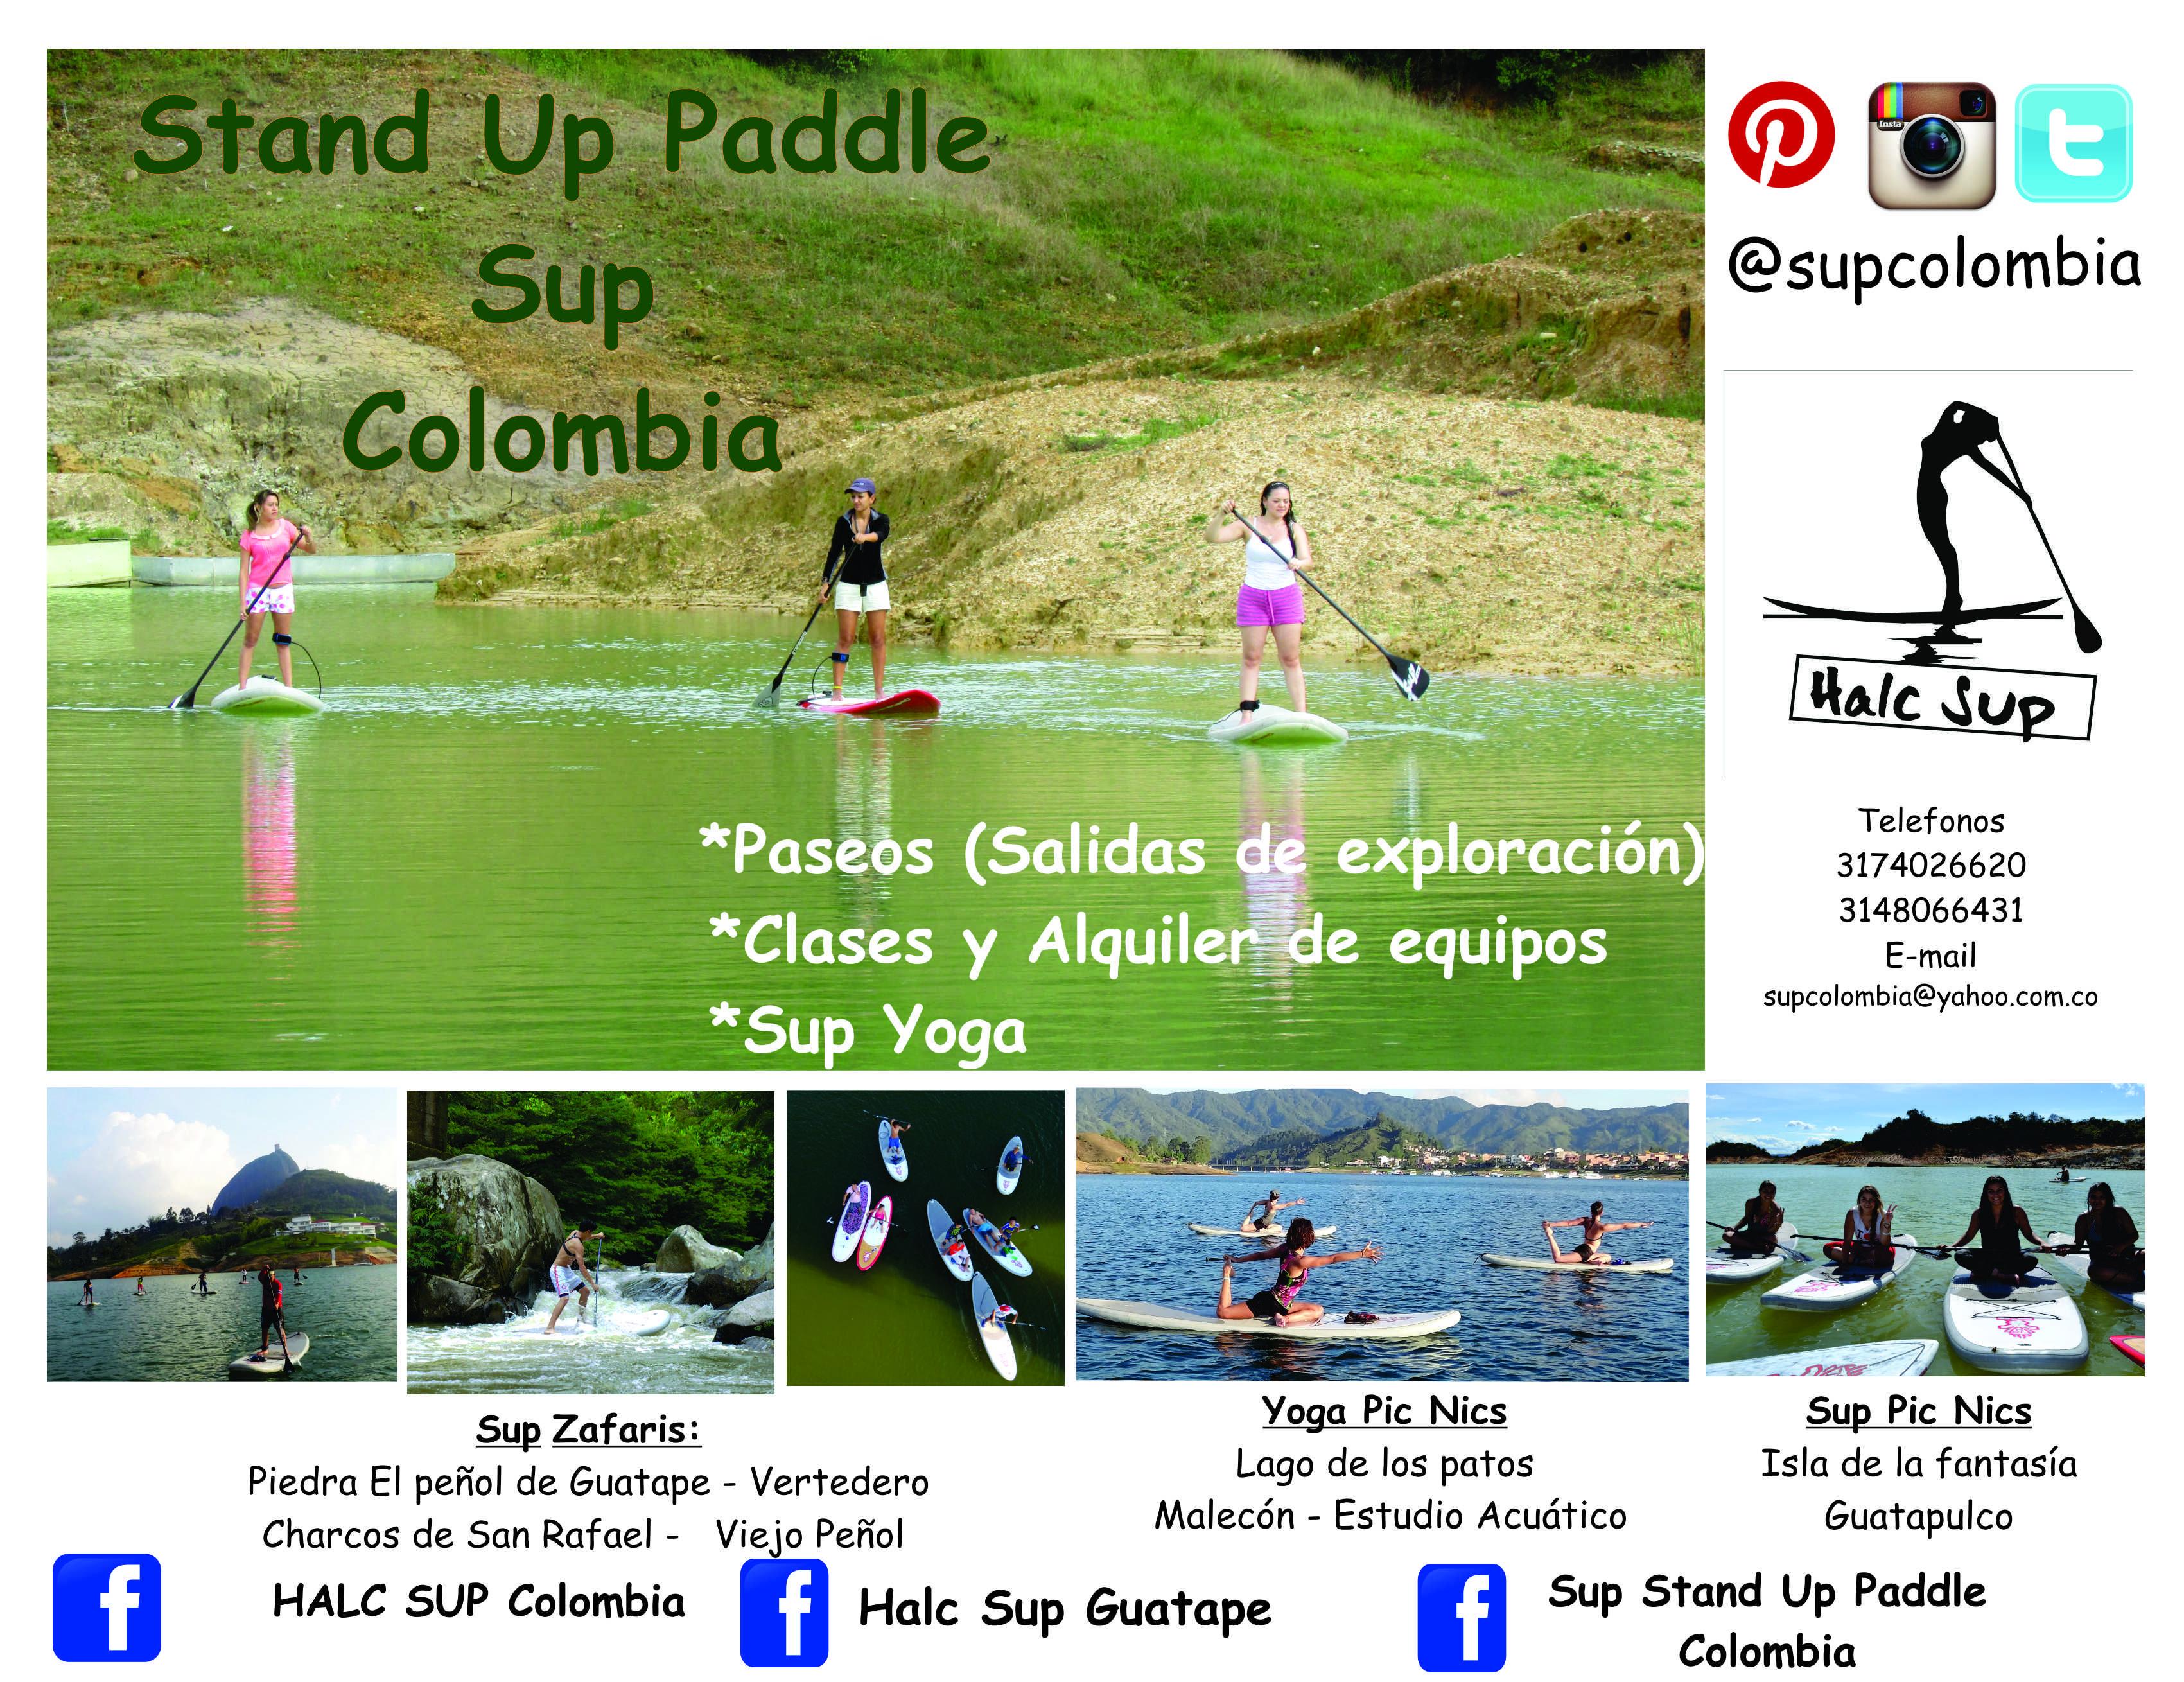 Ven y pasea en #sup por la represa de #Guatape #Antioquia #Colombia #standuppaddle #paddleboard #suptrip